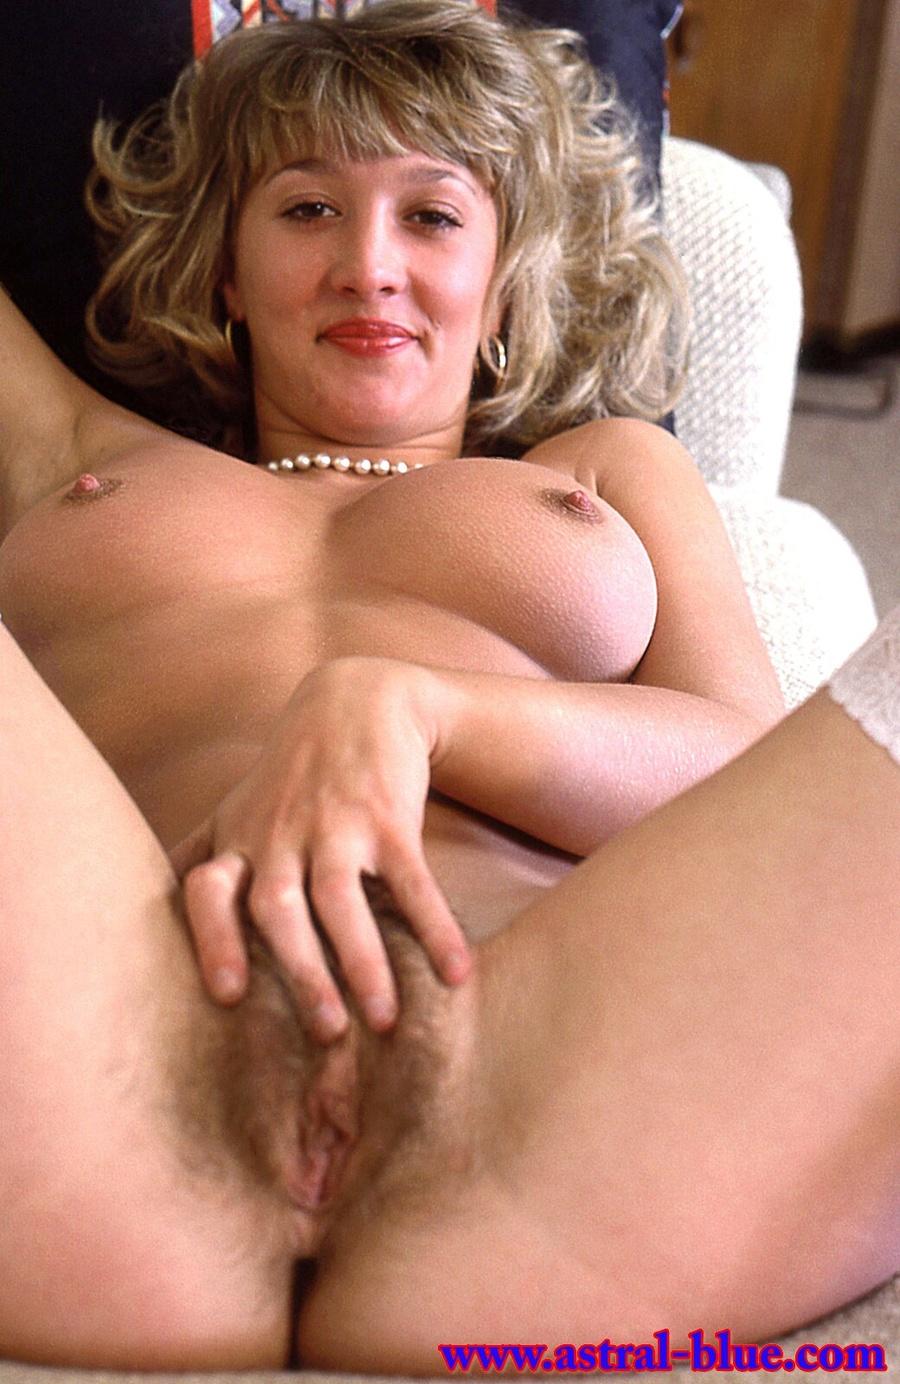 Teen big tits hairy porn